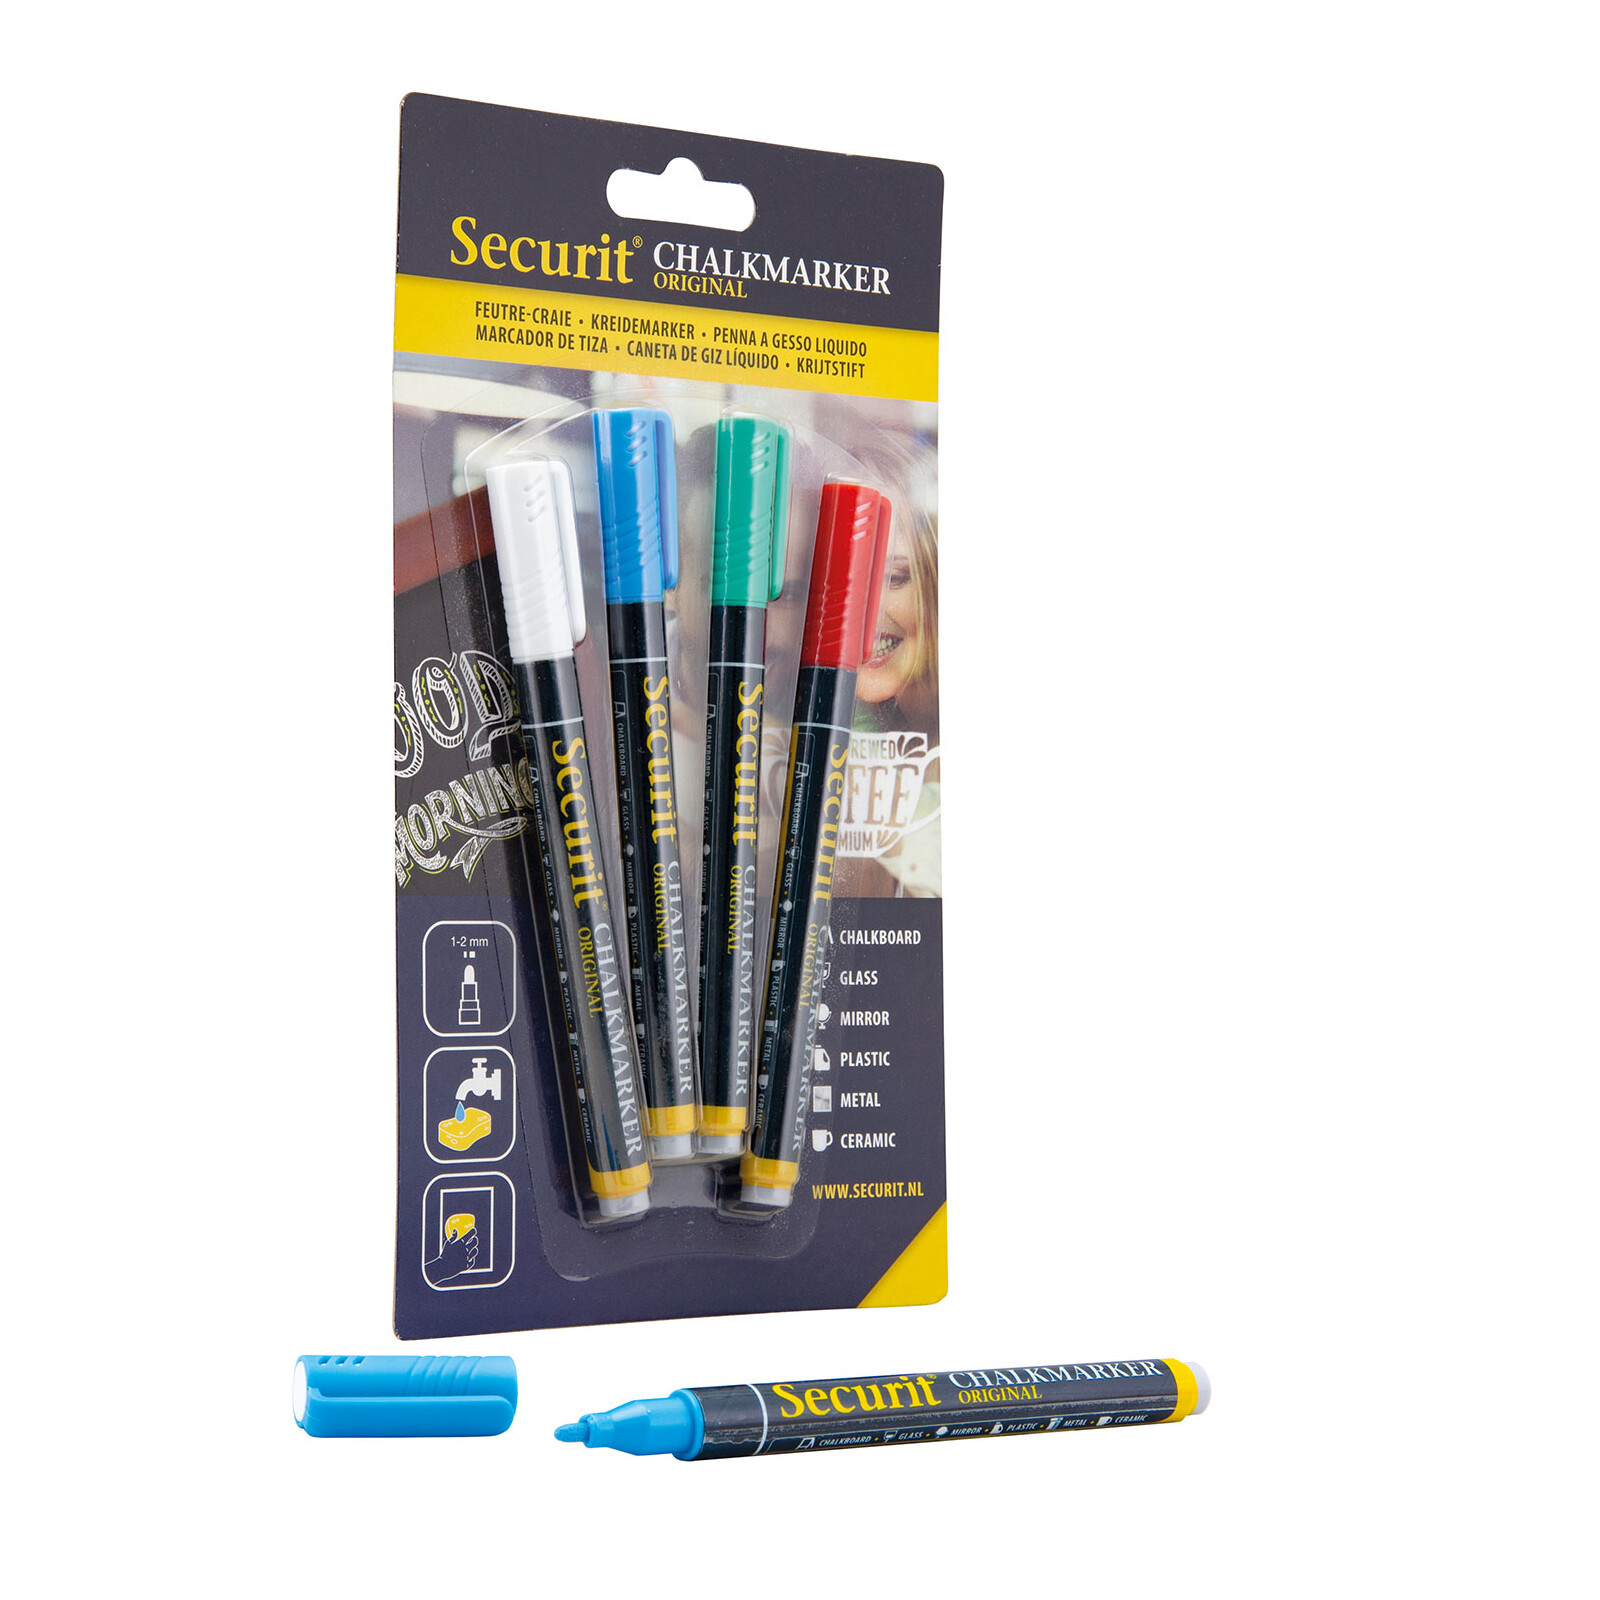 Securit Kreidestifte 1-2mm 4er blau, rot, grün, weiß